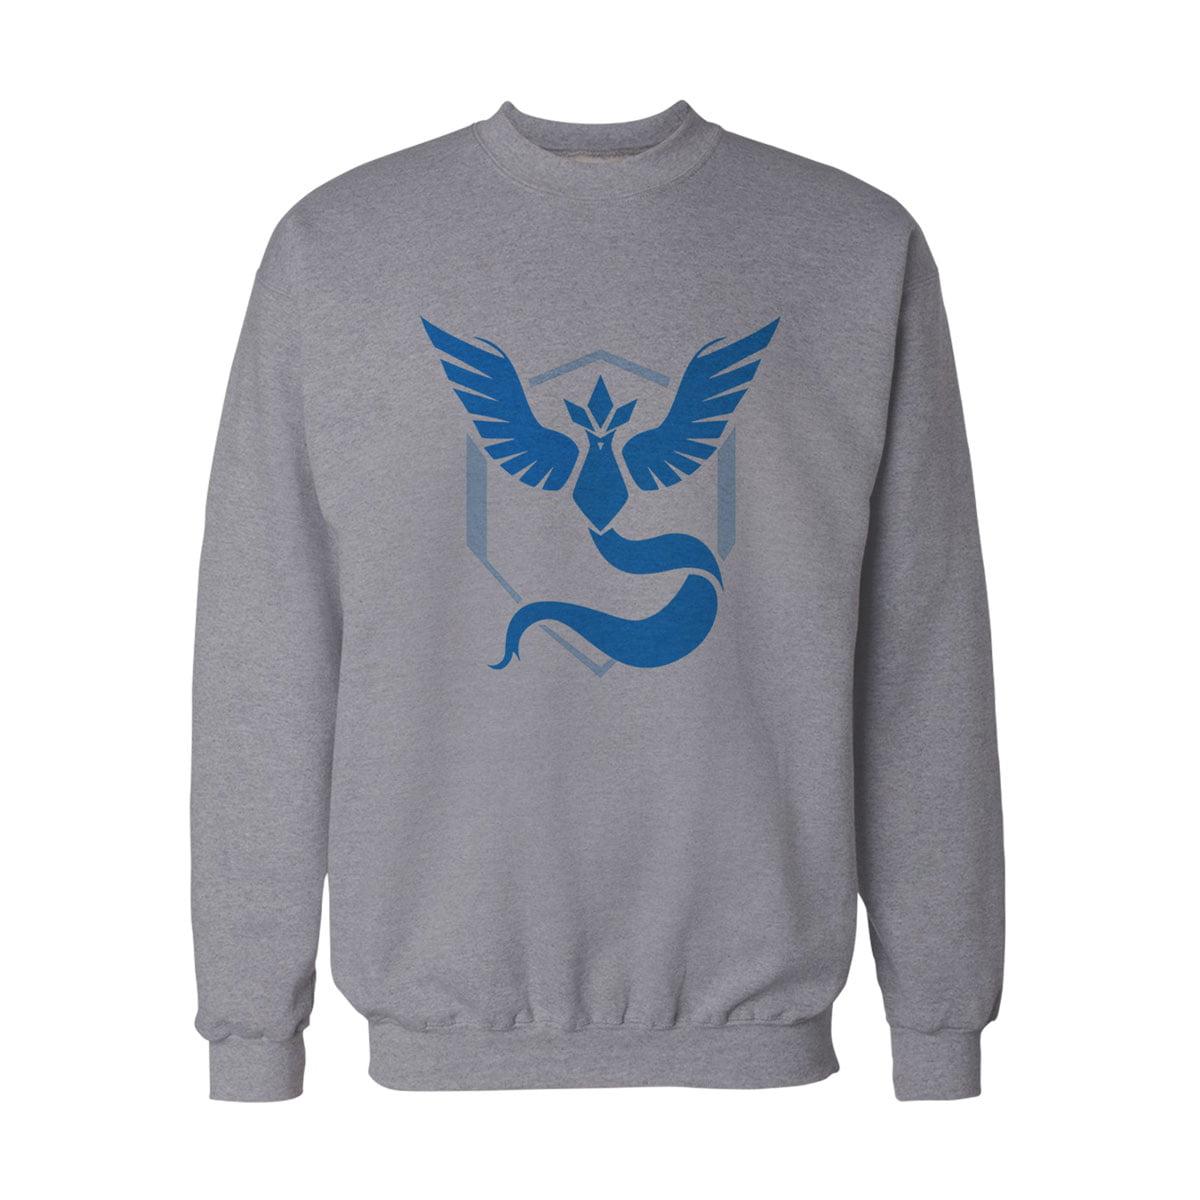 Pokemon Go Mavi Takim Mystic Sweatshirt G - Pokemon Go Team Mystic Unisex Sweatshirt - Figurex